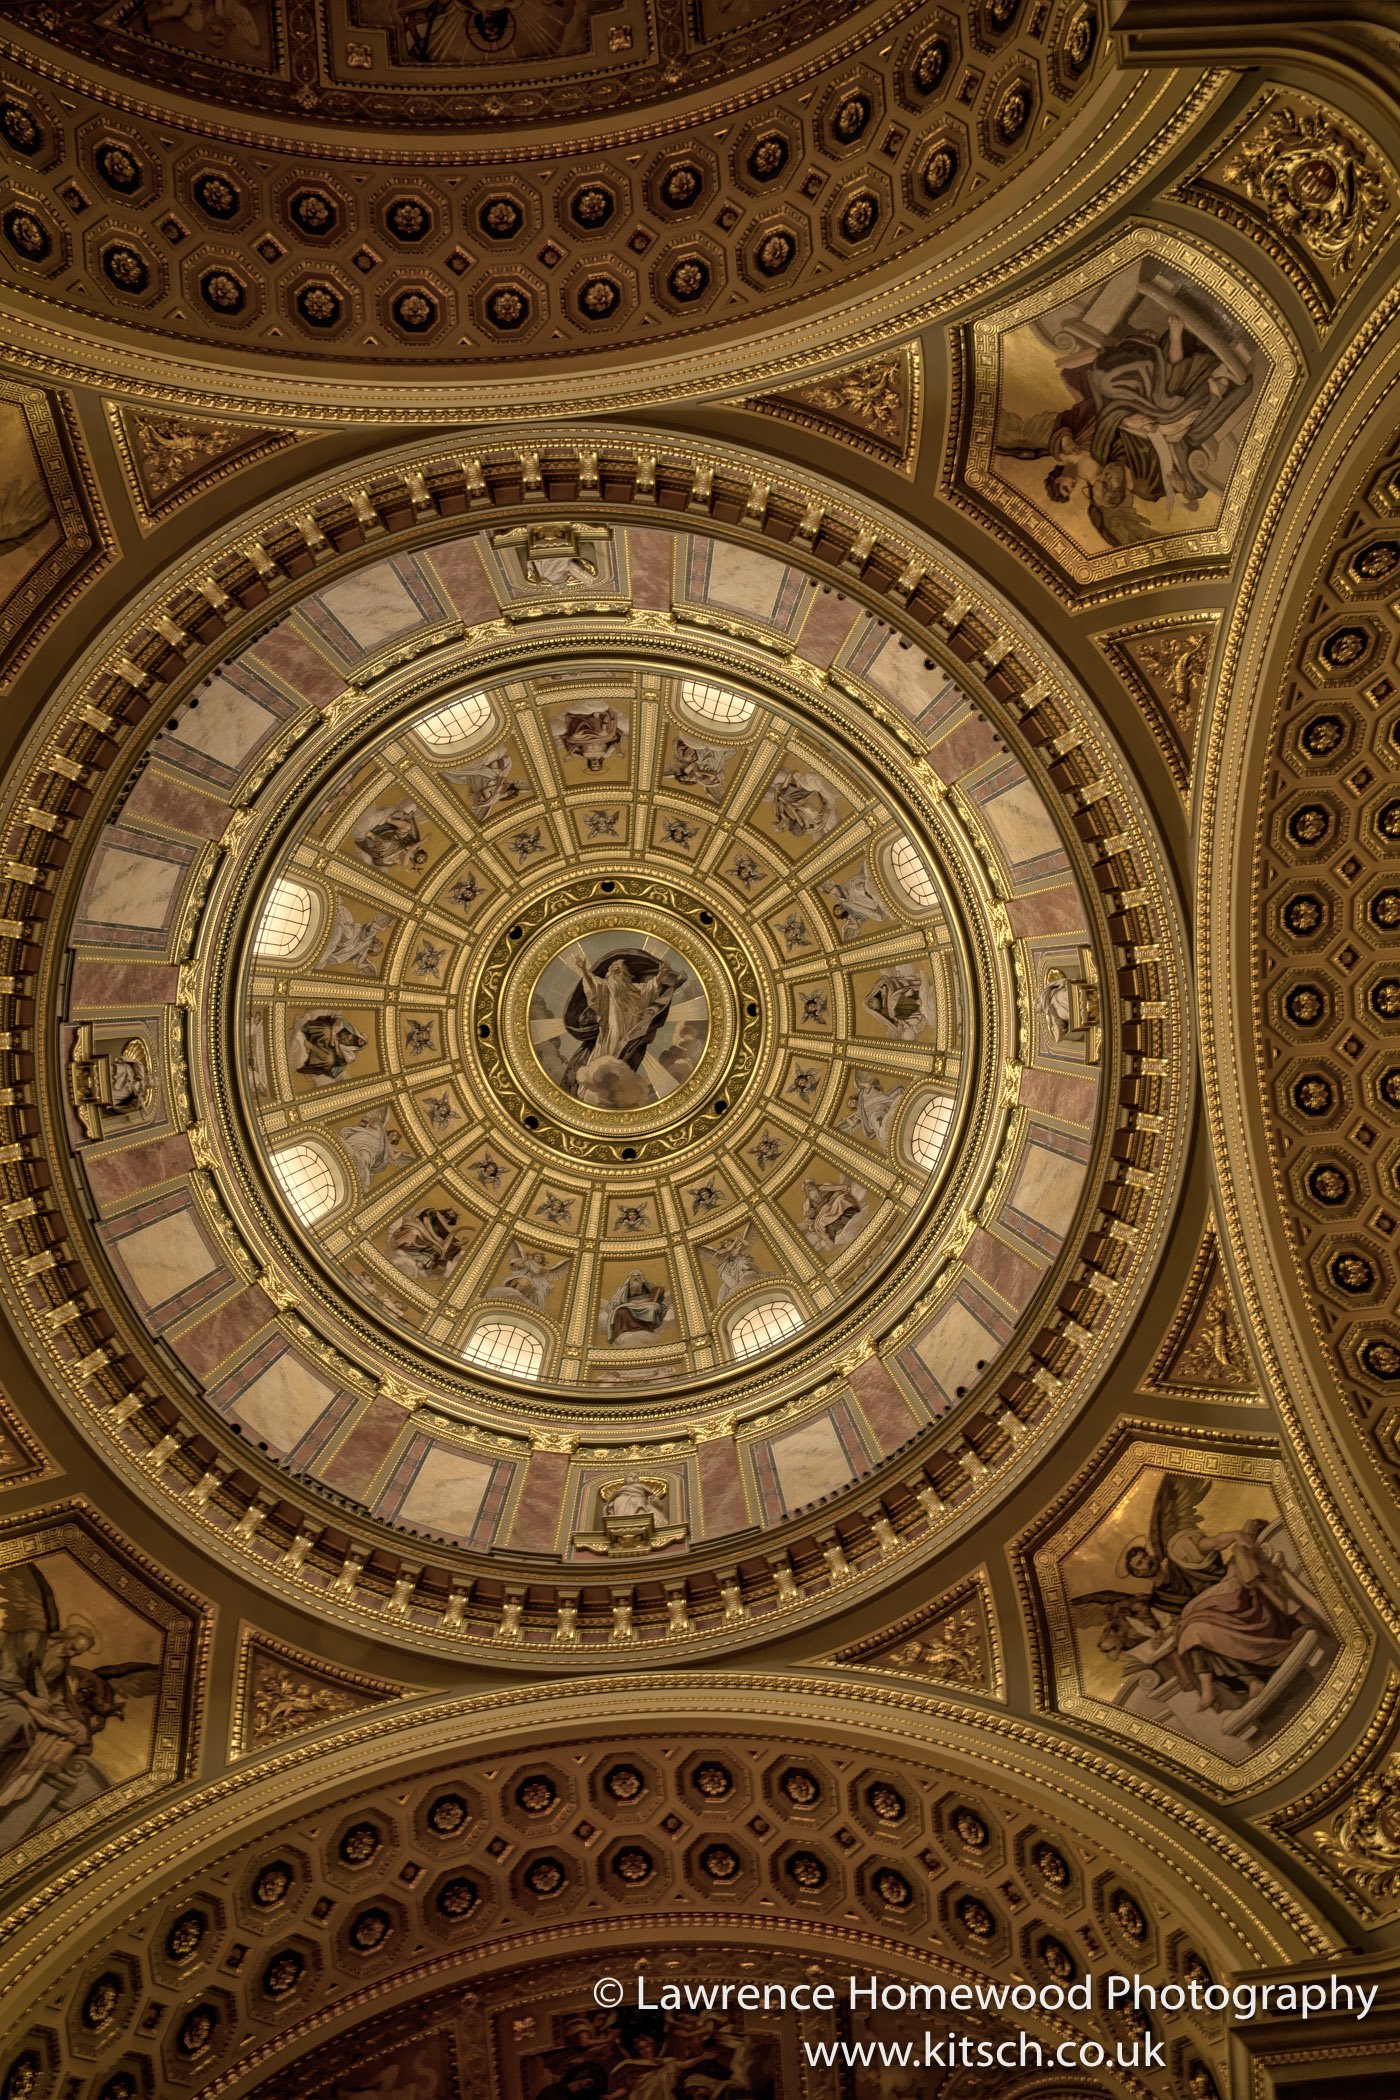 St Stephen's Basilica Ceiling